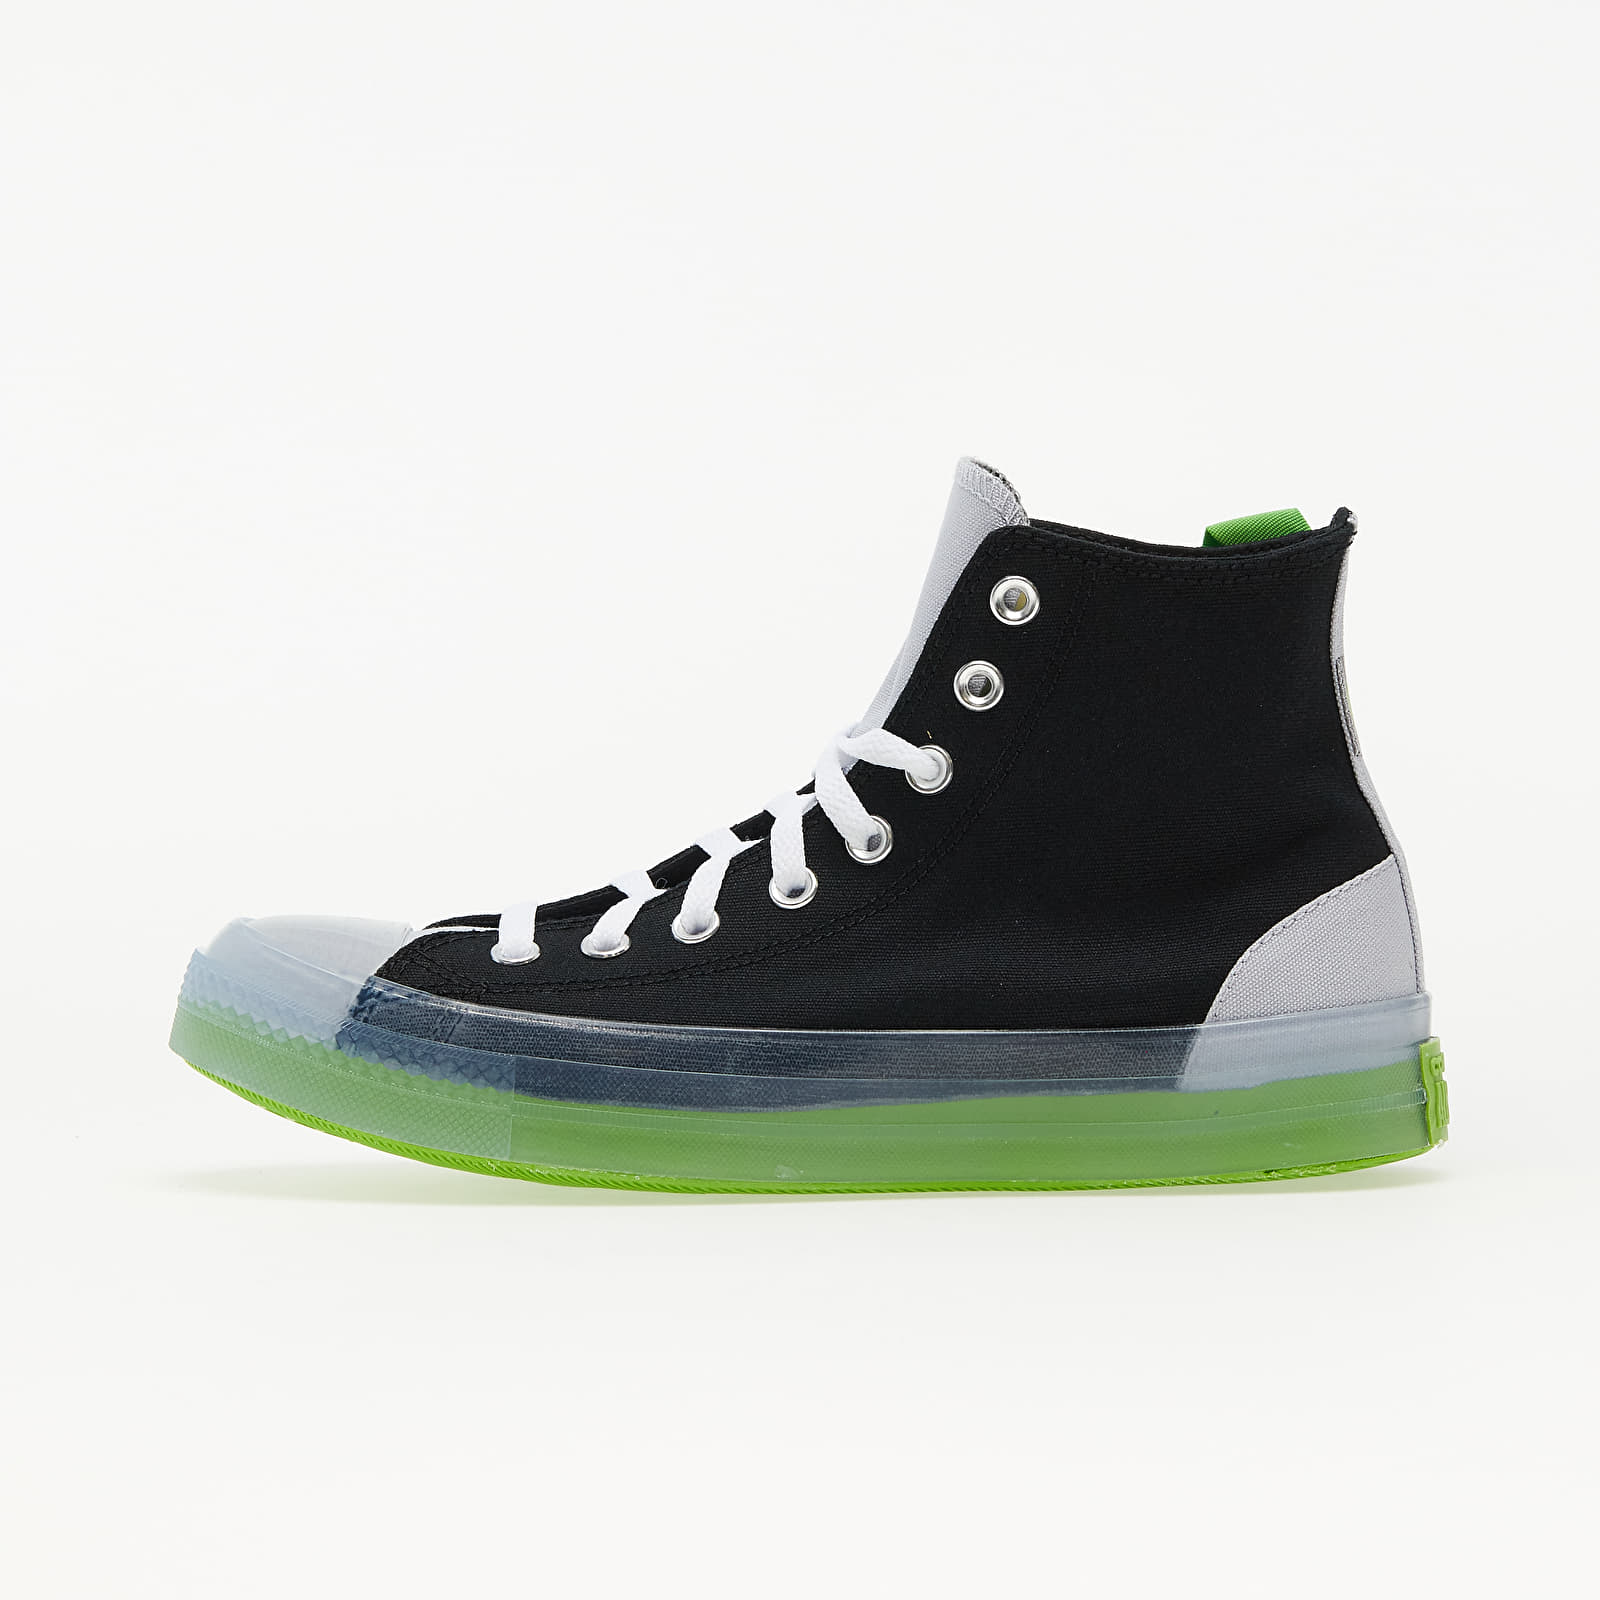 Converse Chuck Taylor All Star CX Black/ Gravel/ Bold Wasabi EUR 42